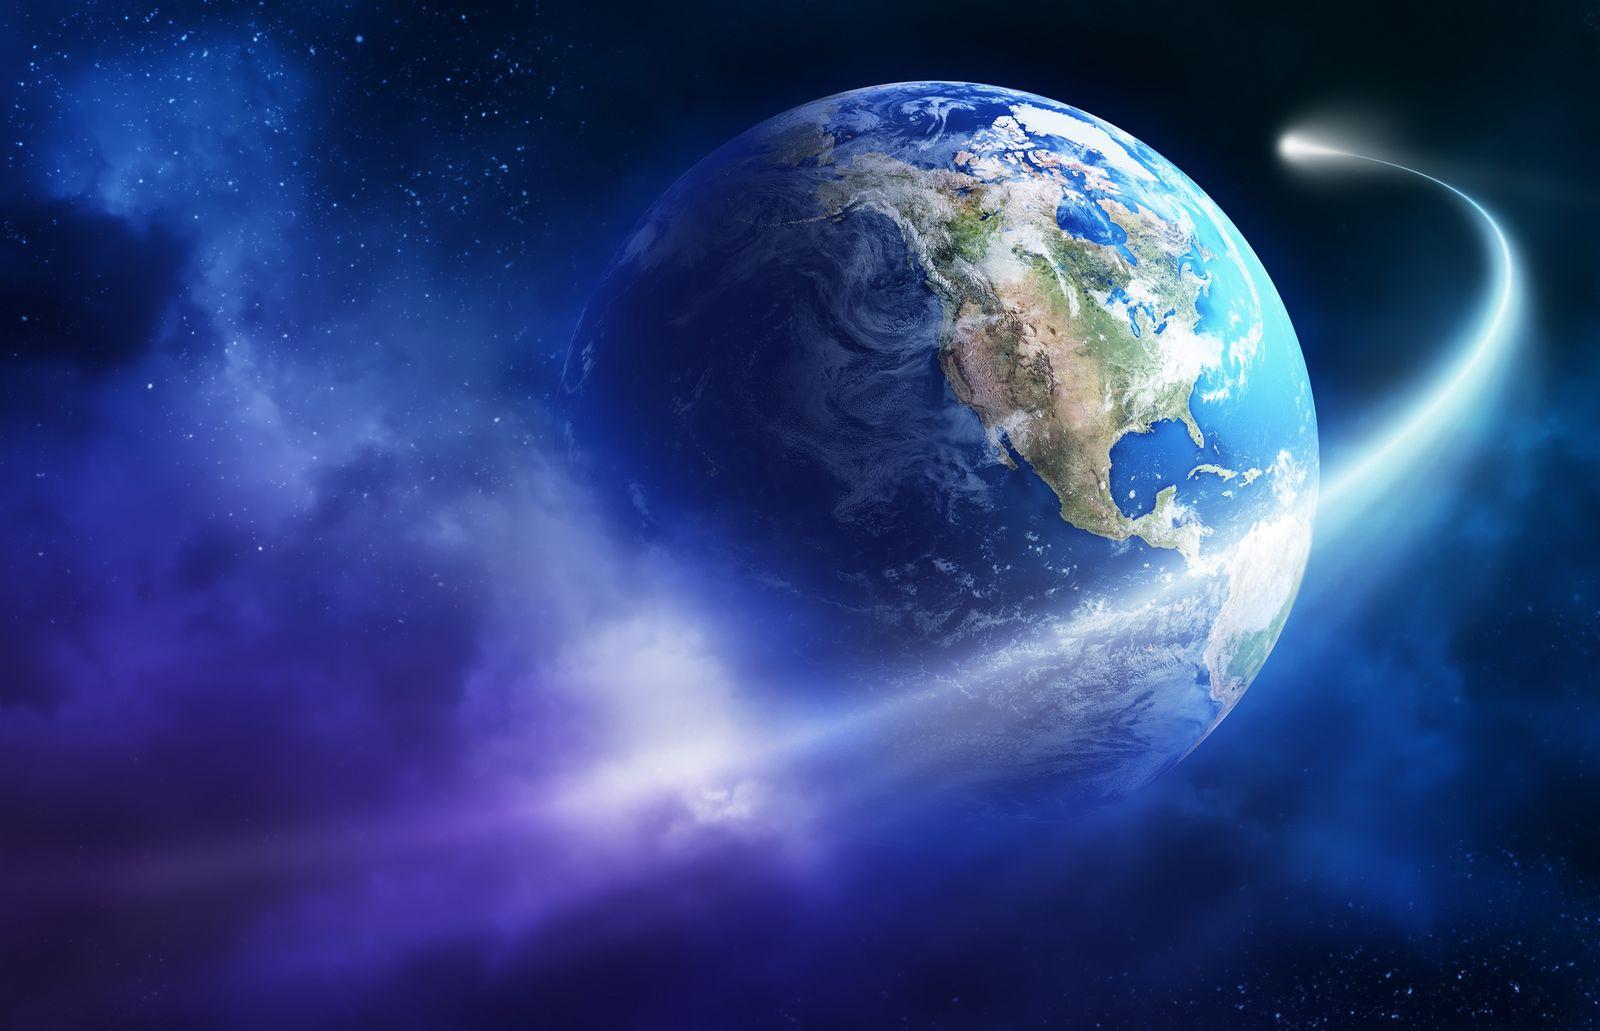 ¿Los Desastres Naturales son un Aviso o un Castigo de Dios?